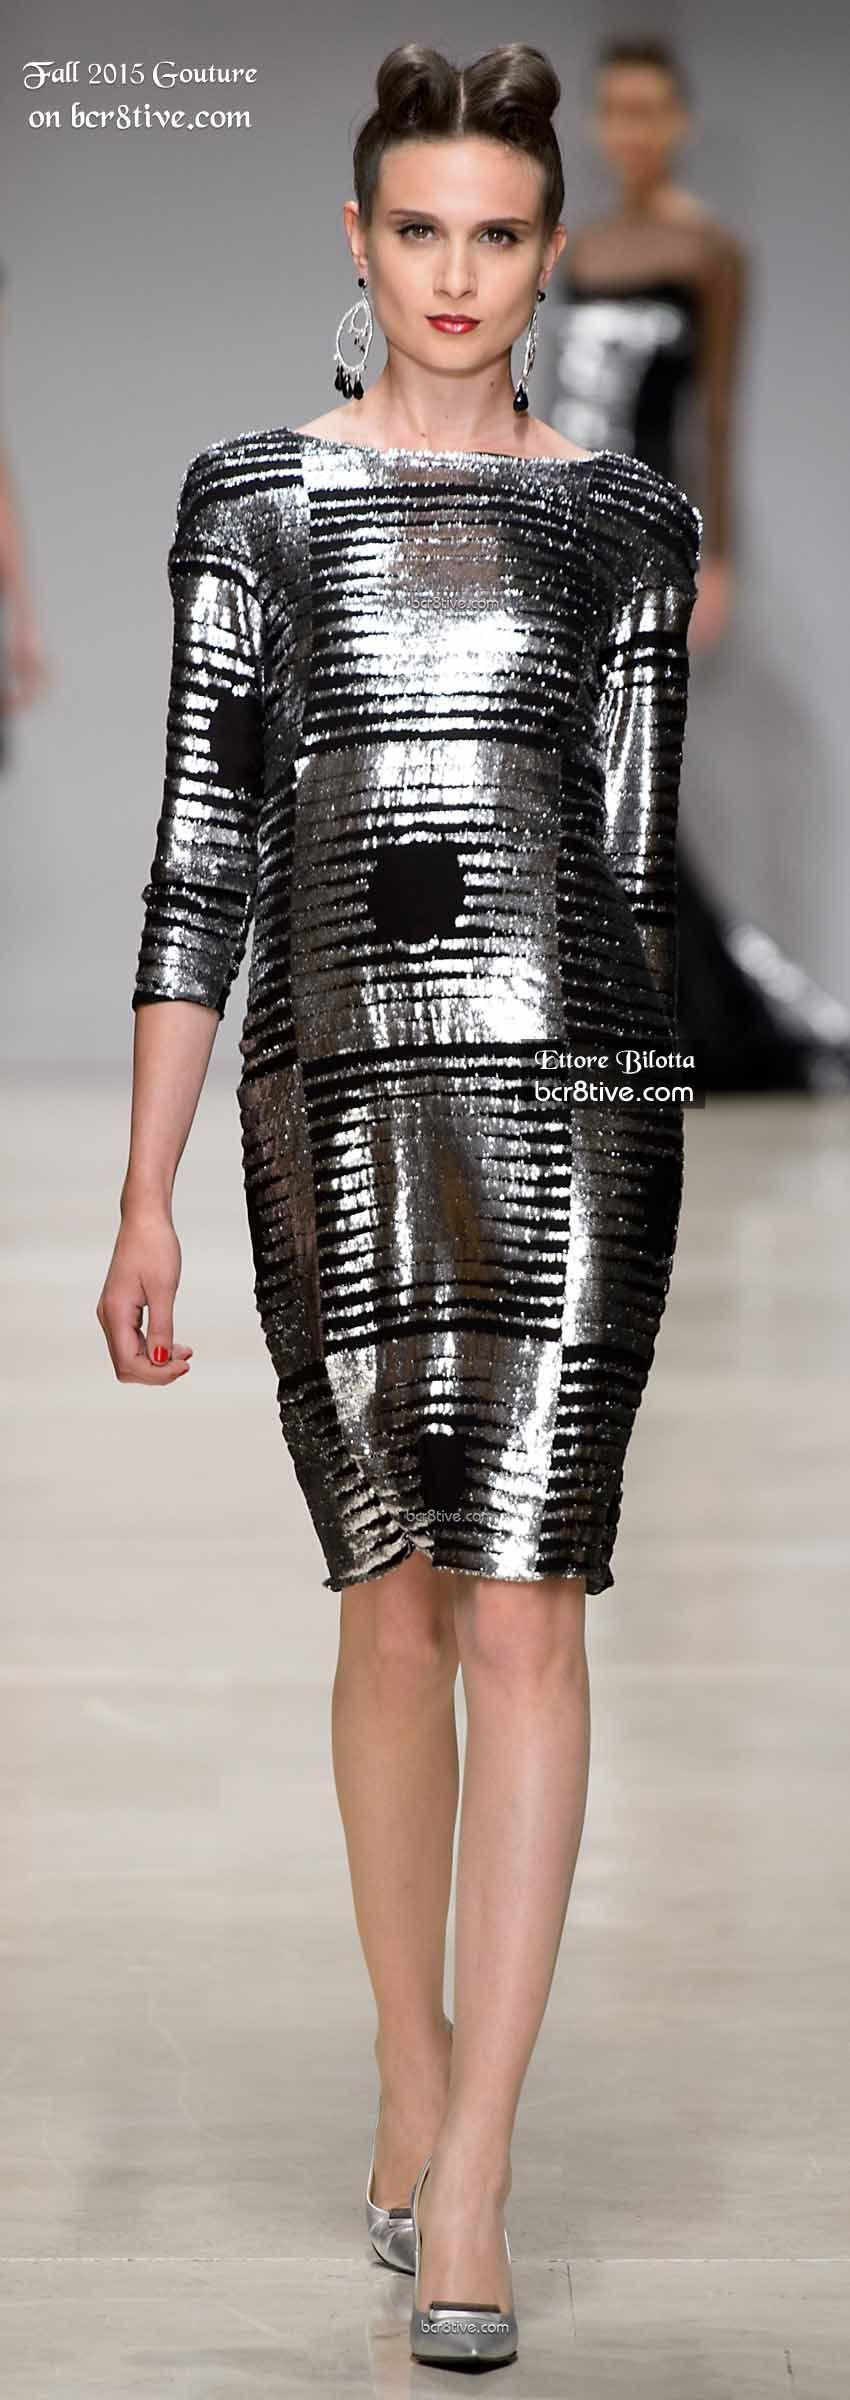 Ettore Bilotta Couture Fall 2015-16